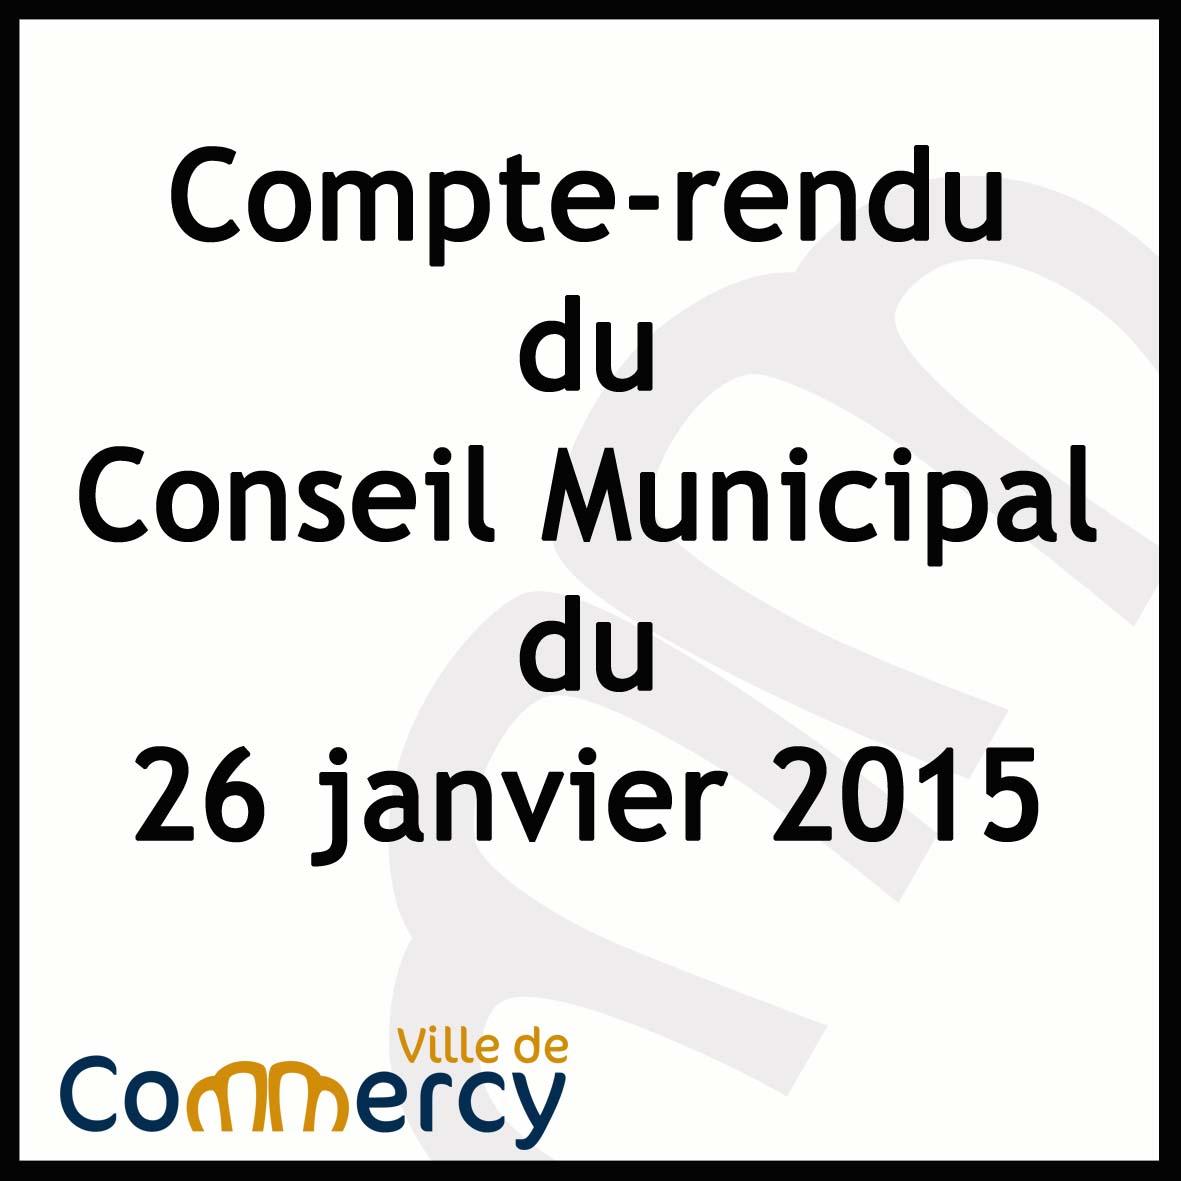 CRCM_20150126